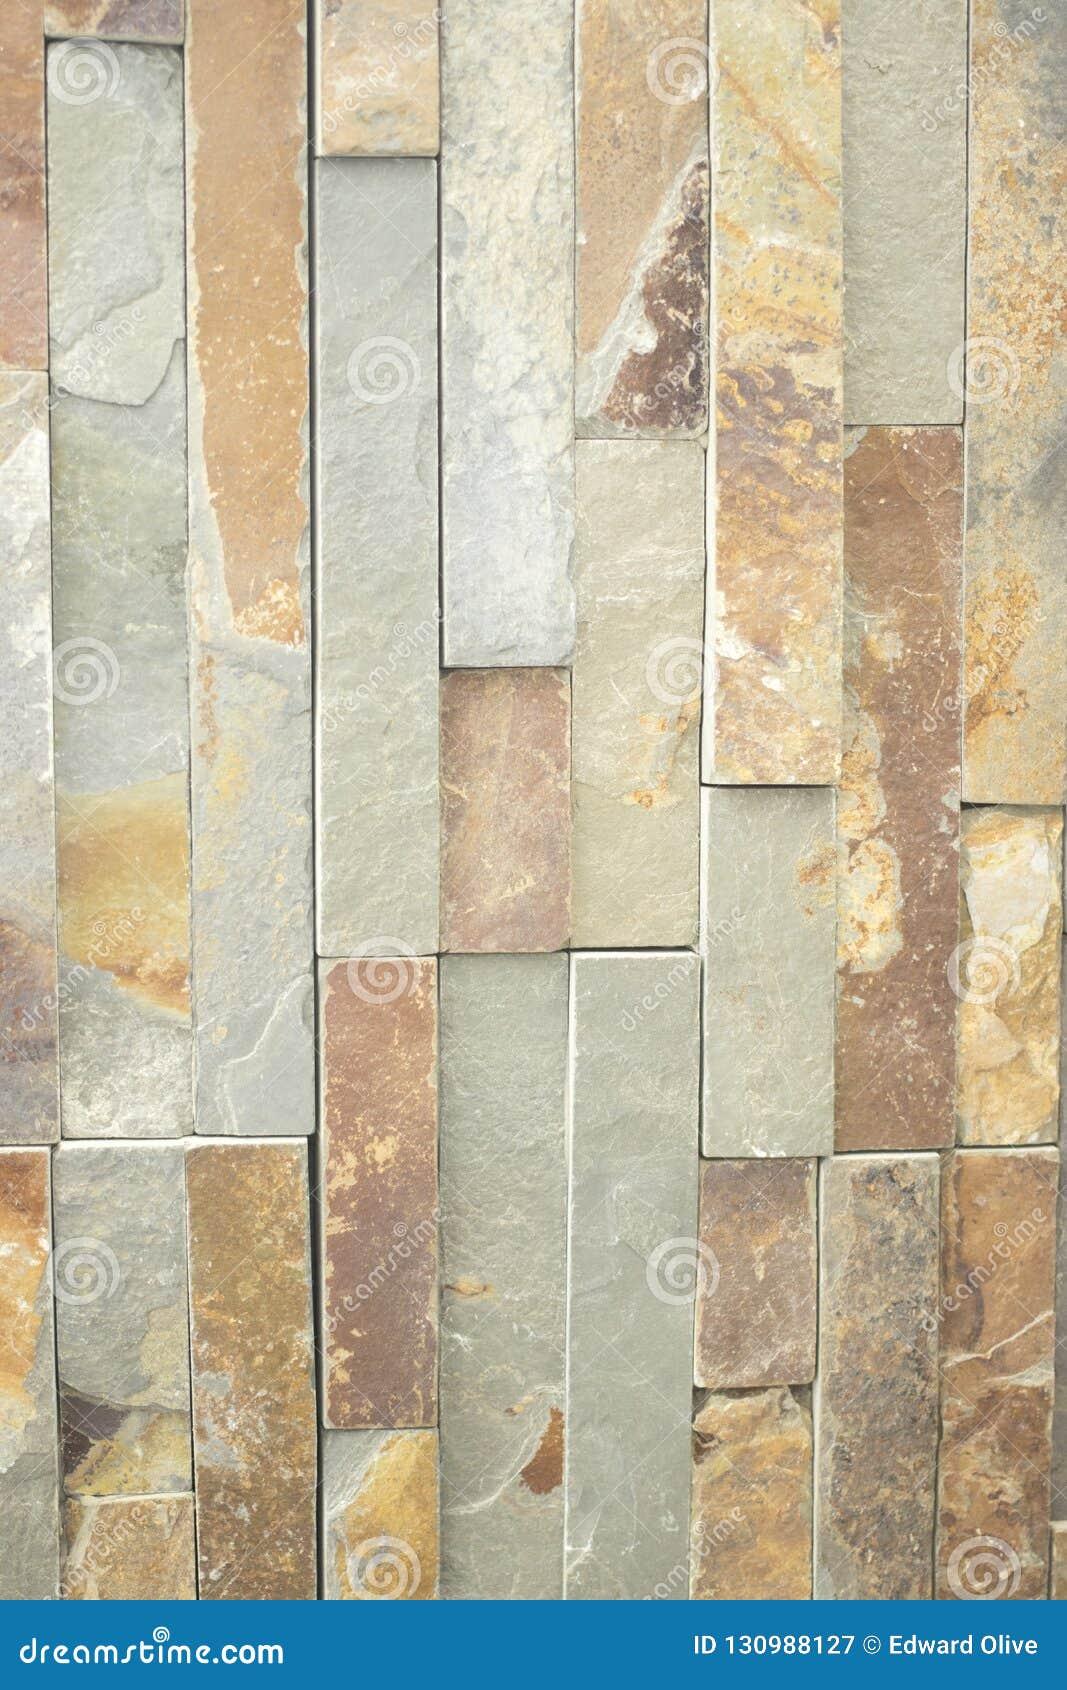 Kitchen Bathroom Tiles Stone Effect Stock Image - Image of ...